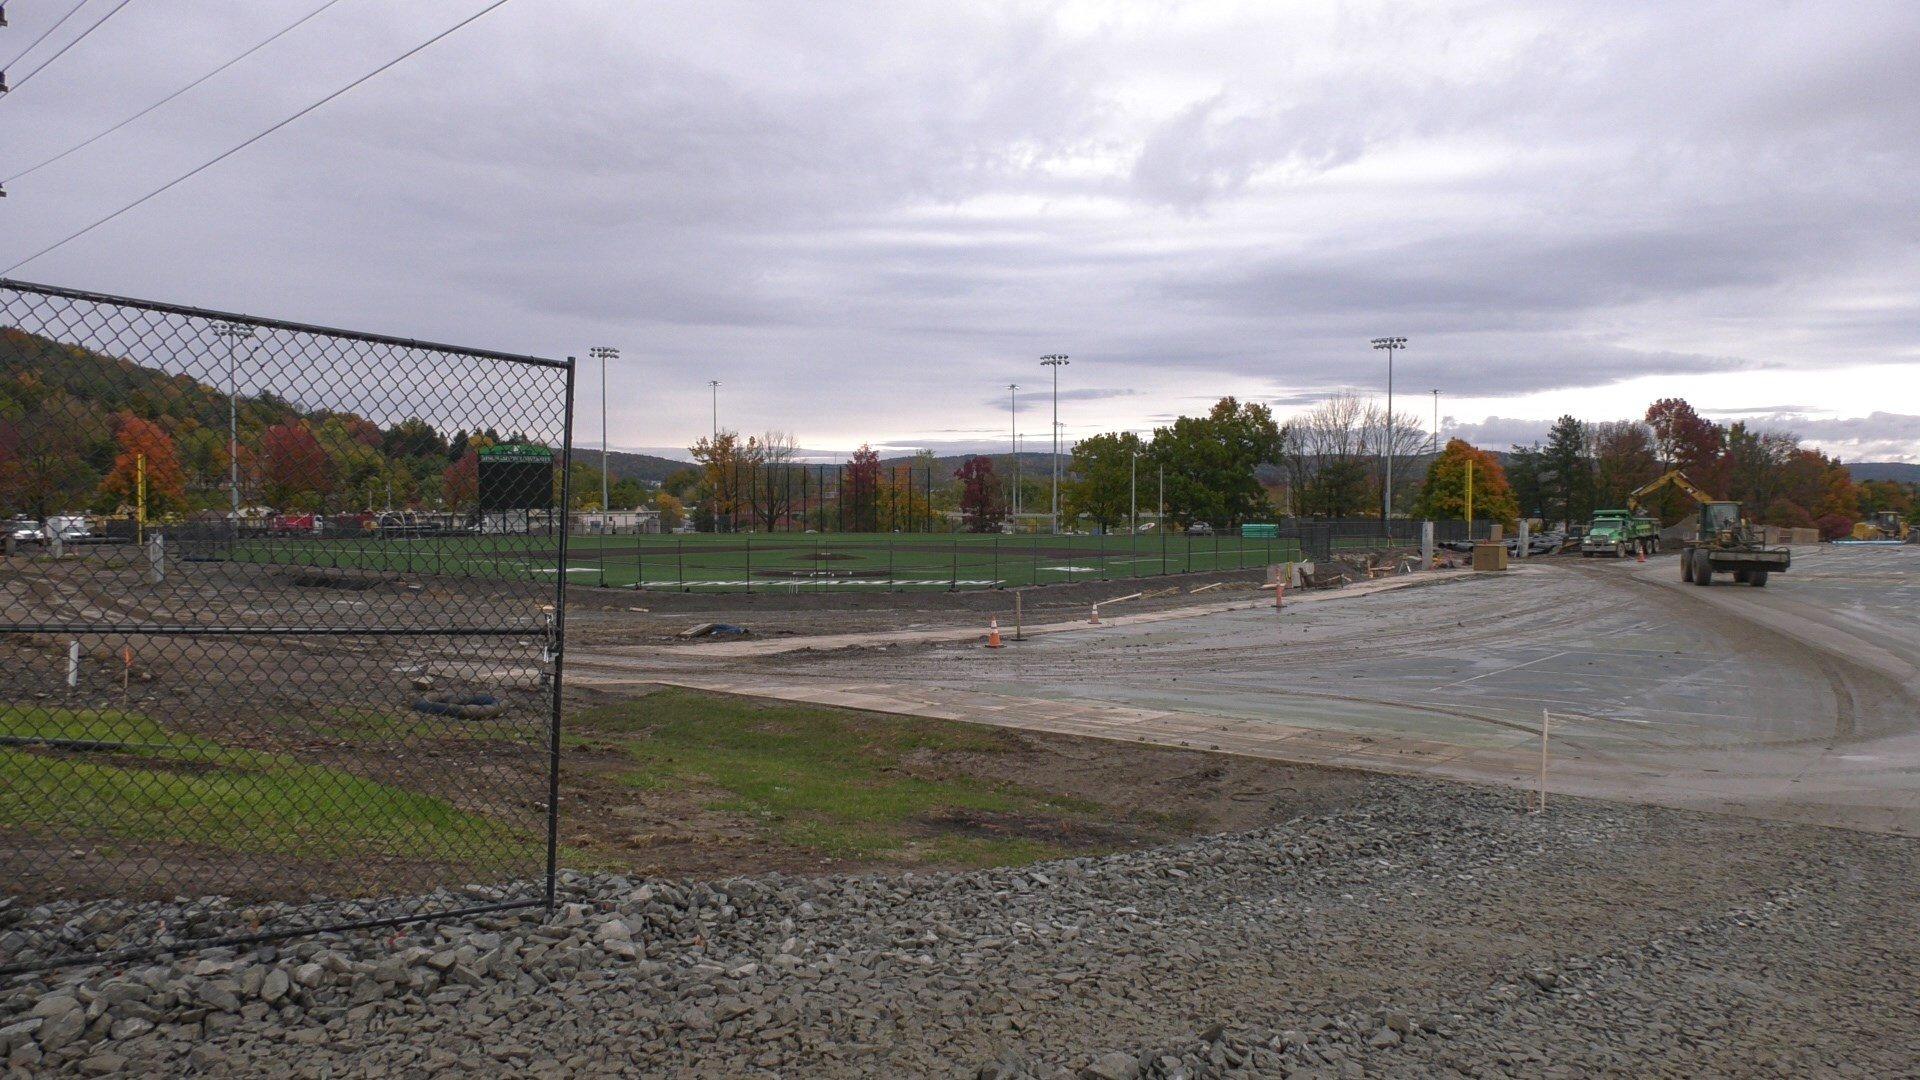 Binghamton University Spring 2022 Calendar.Binghamton University S Baseball Complex Construction Is Well Un Wicz